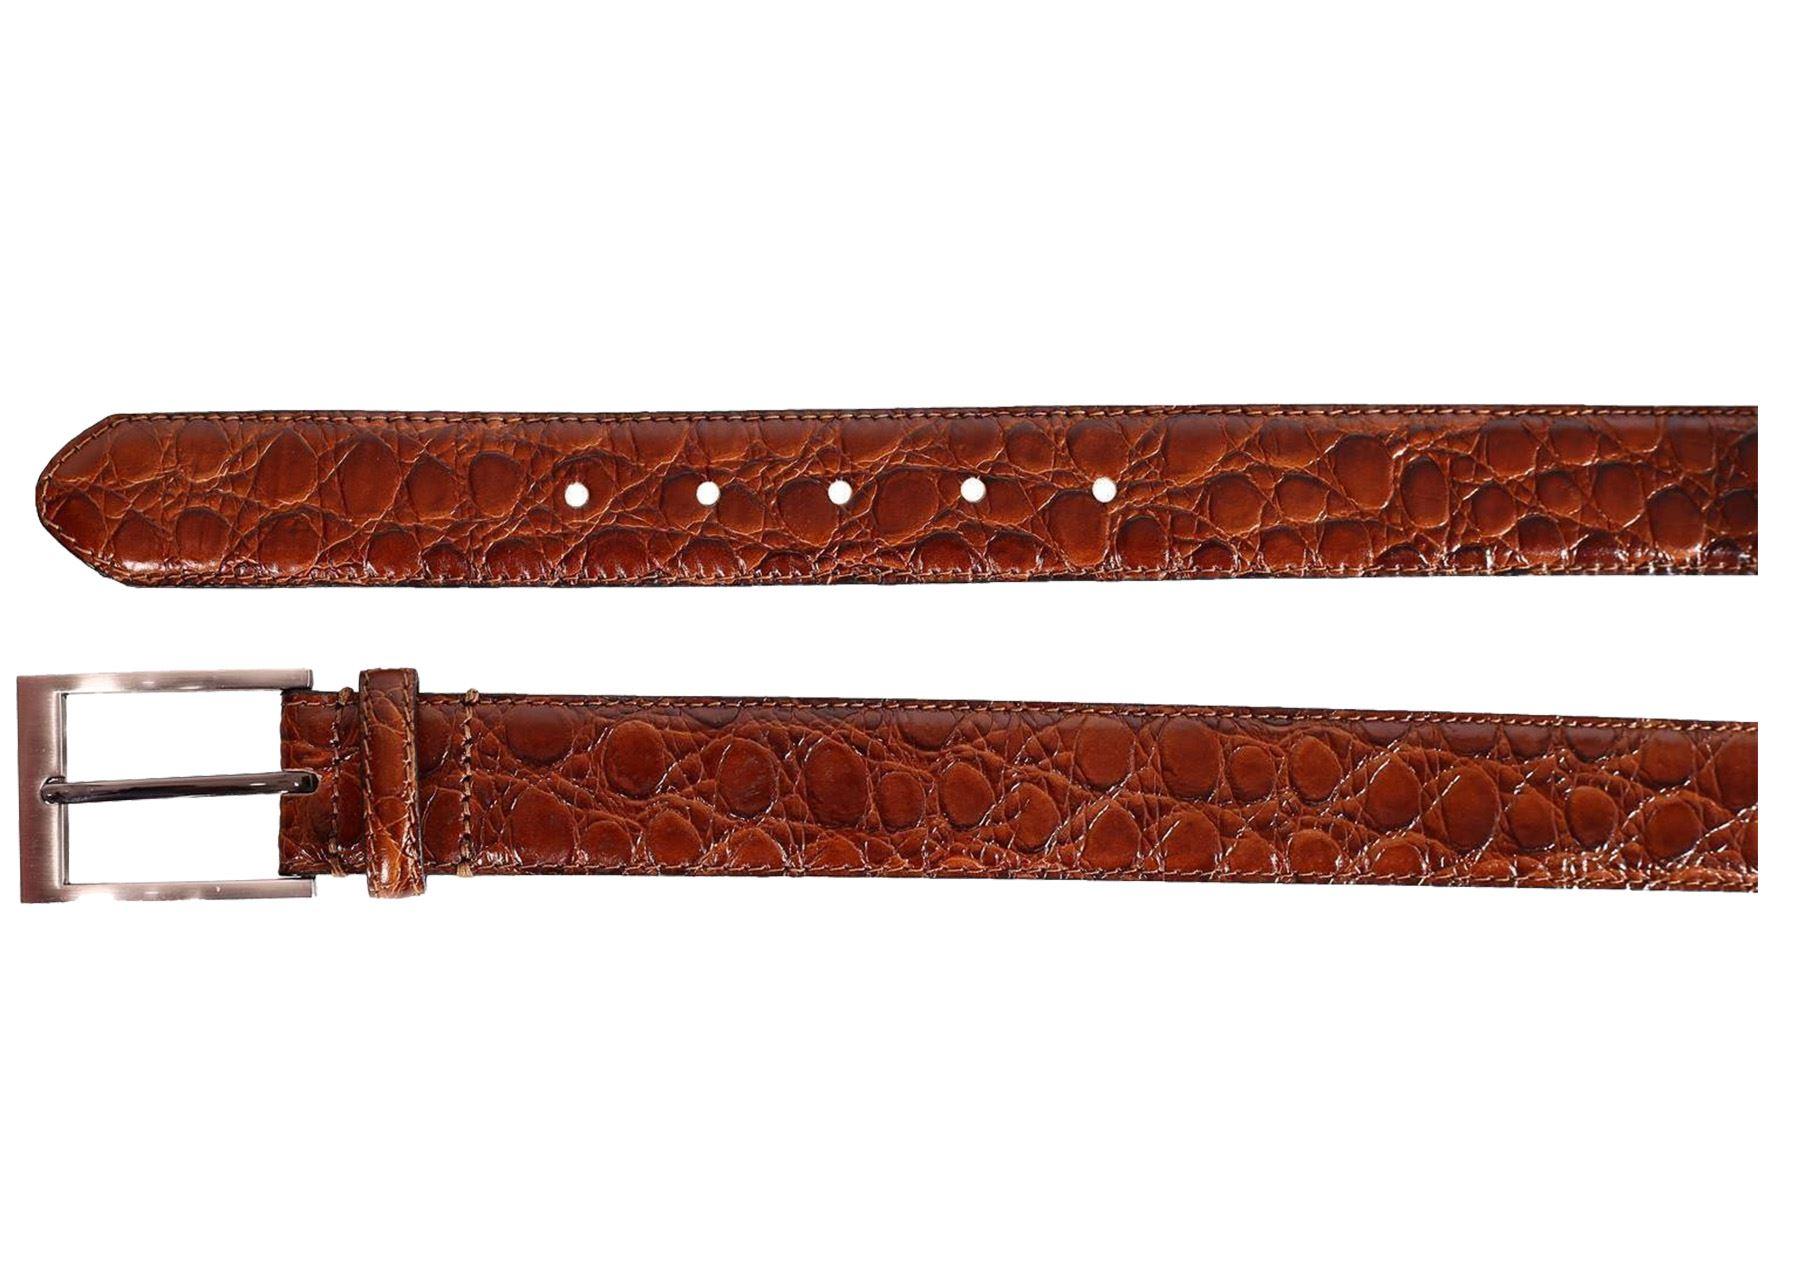 NUOVI Pantaloncini Uomo Vera Pelle Pelle Di Serpente AZTEC PATTERN elegante cinture S-XXXL